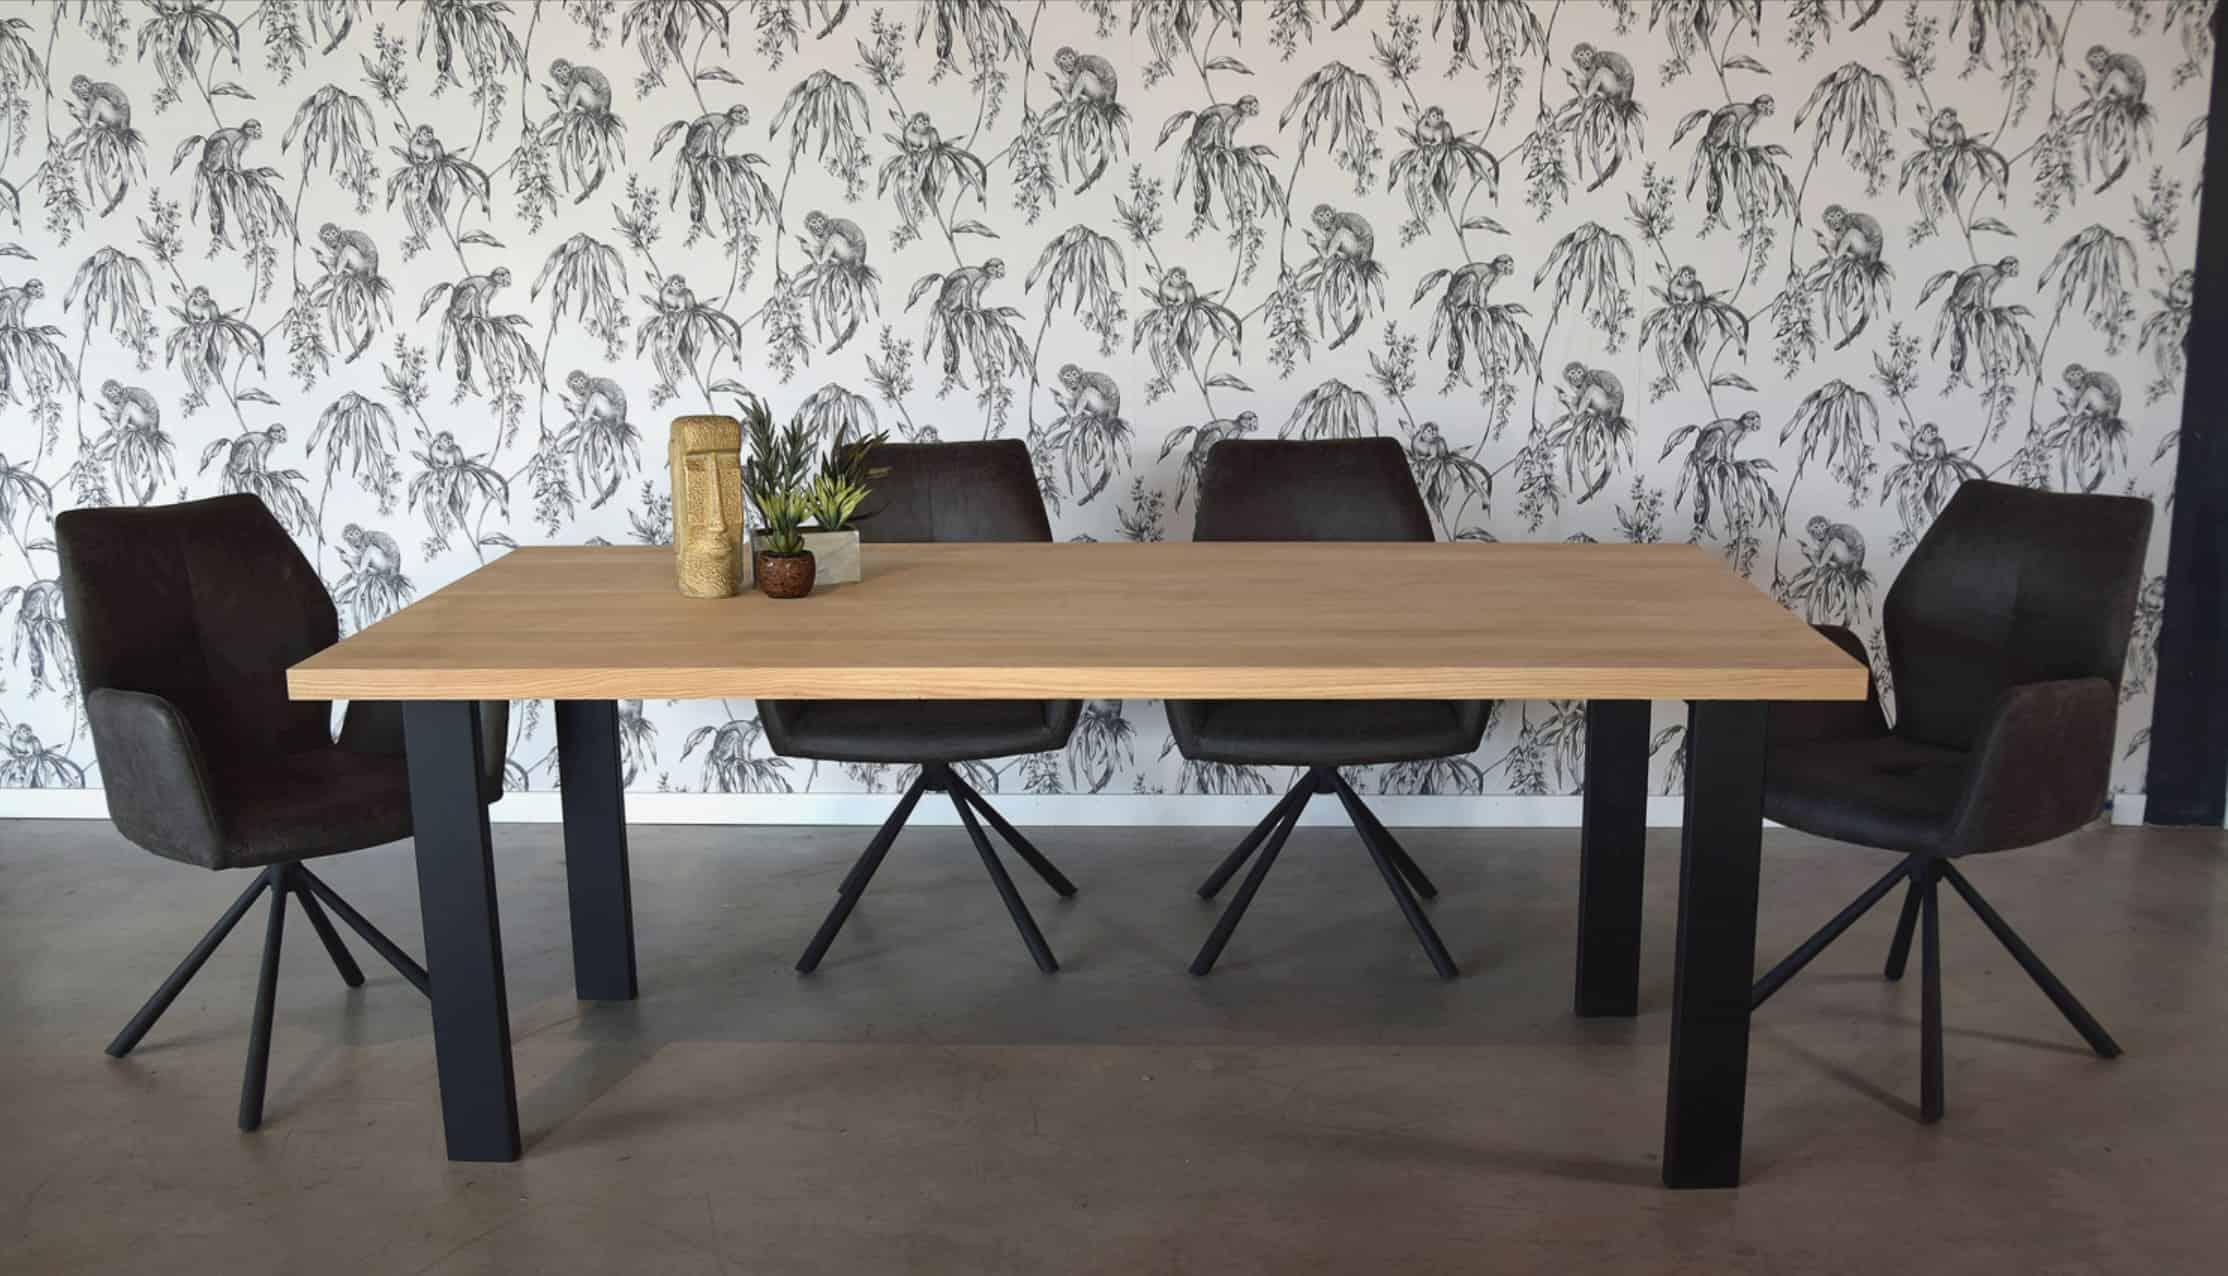 Rustiek eiken tafel, afwerking: matte lak